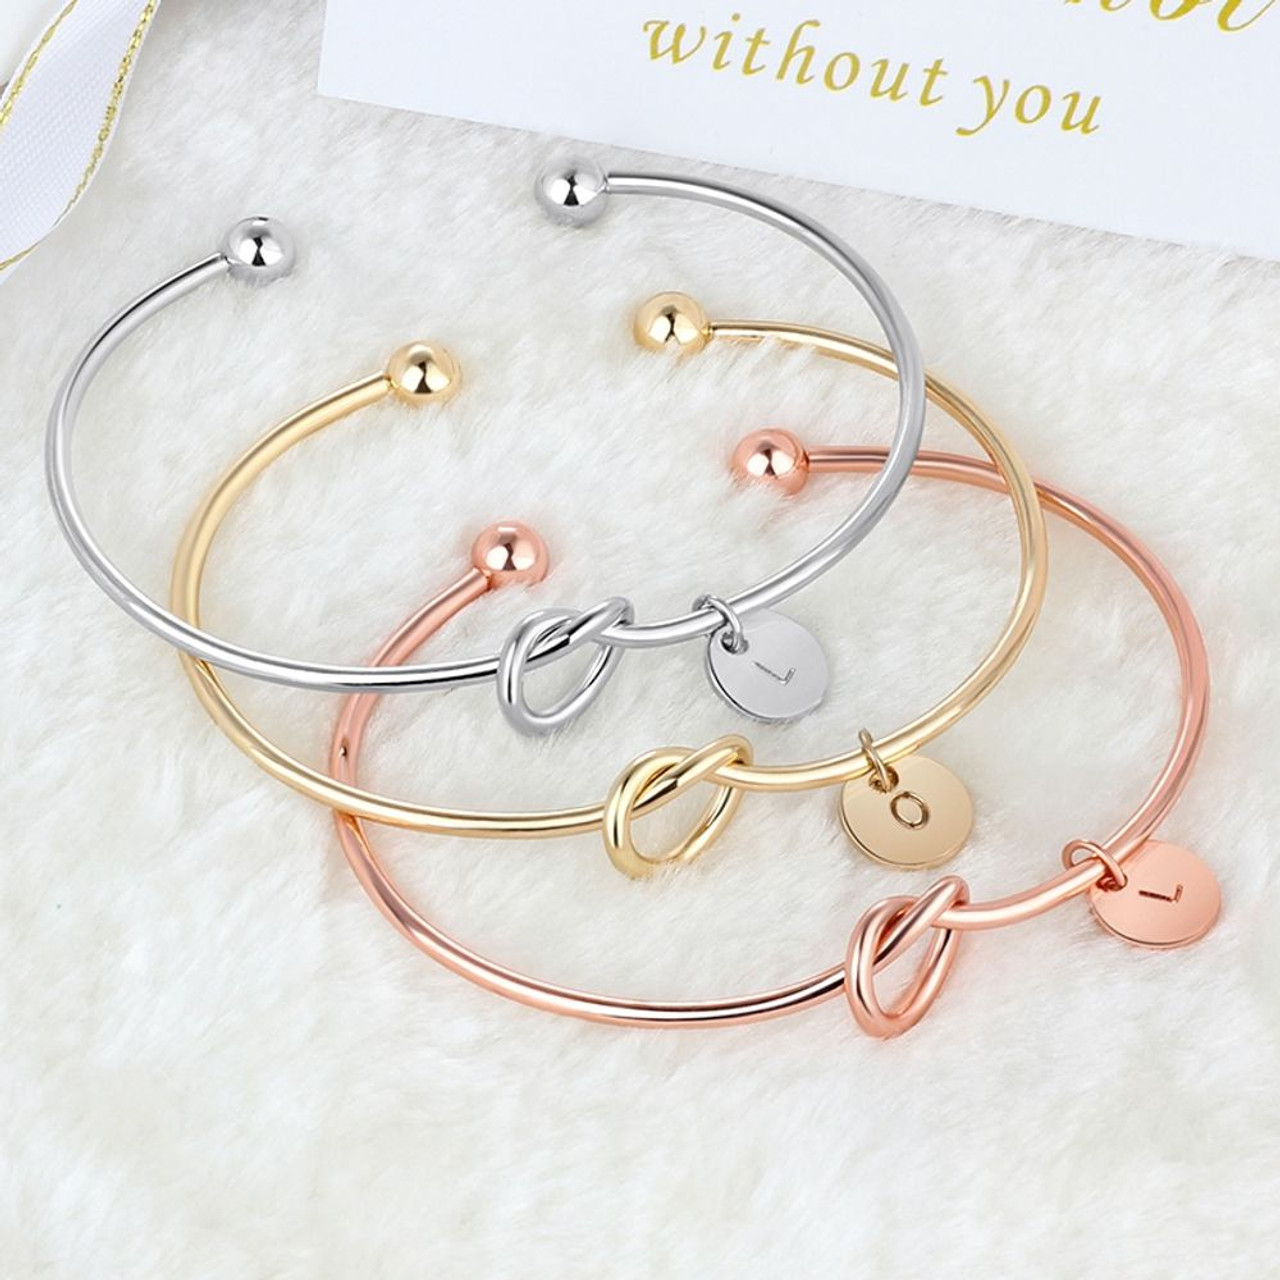 Mother/'s day gift Eternity bracelet Personalized bracelet Mothers bracelet 3 initial monogram Three initial bracelet